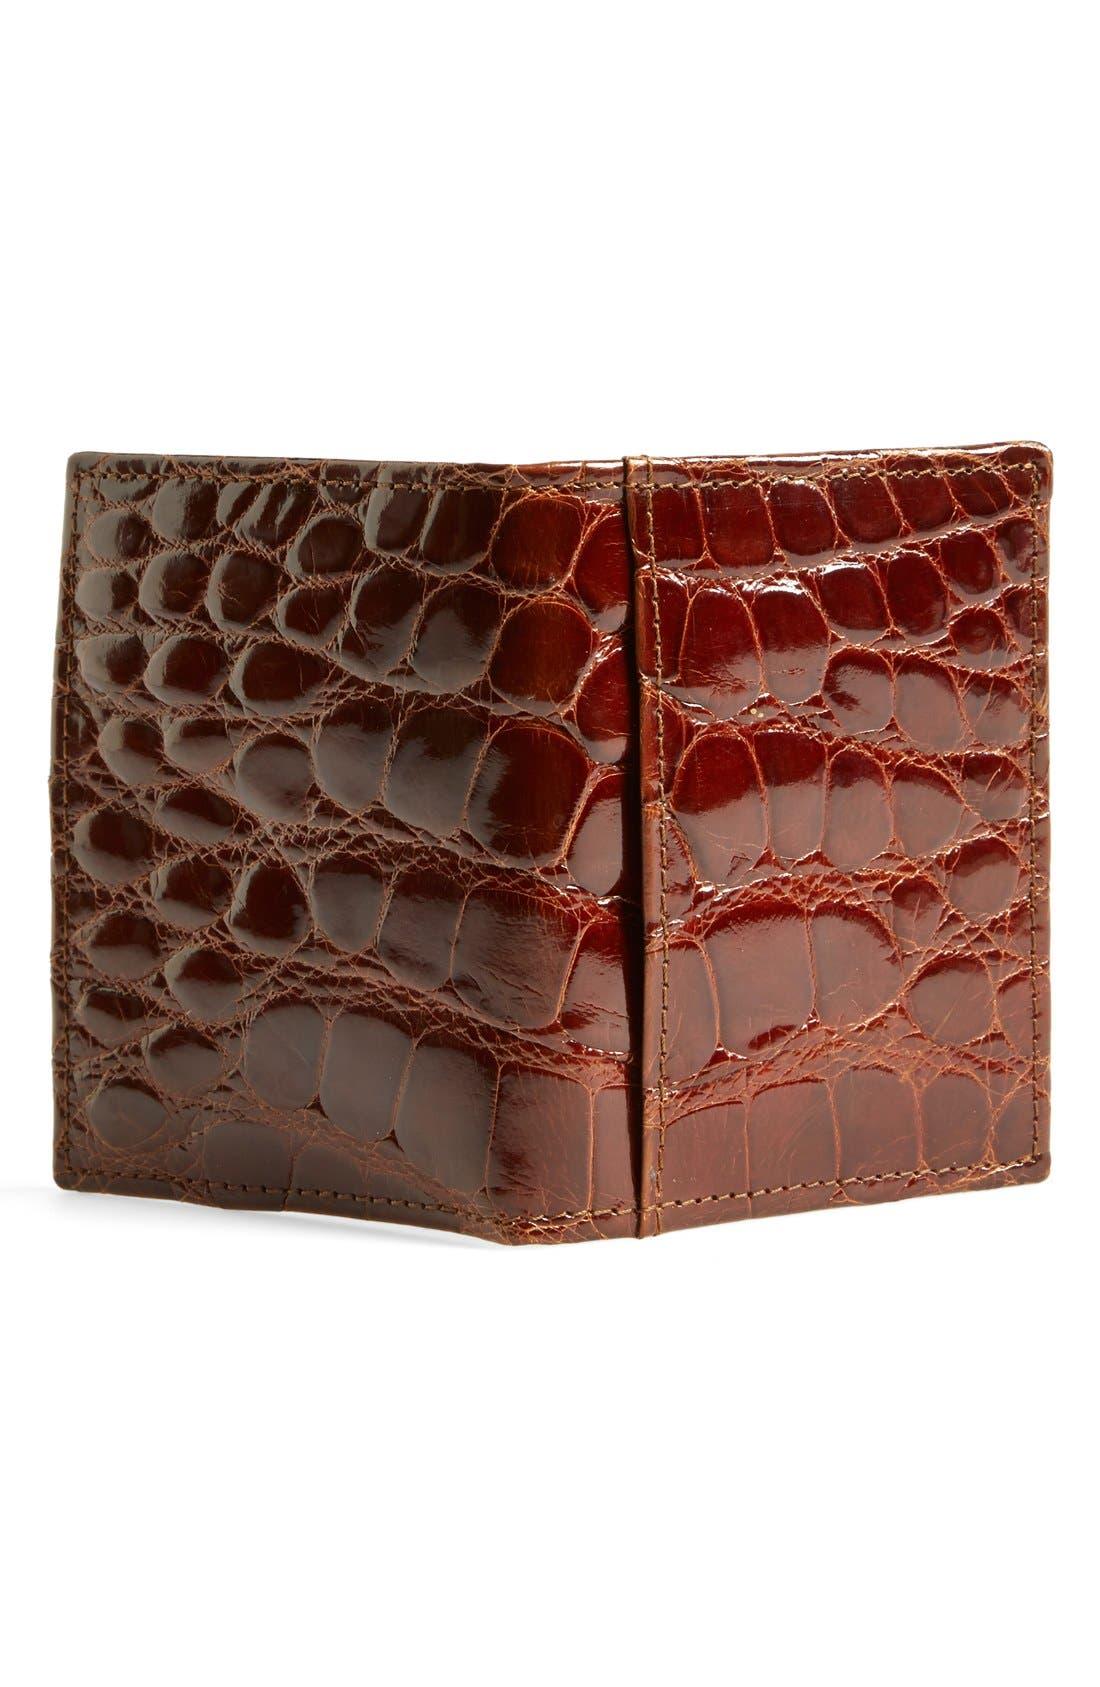 'Joseph' Genuine American Alligator Leather ID Wallet,                             Alternate thumbnail 2, color,                             COGNAC